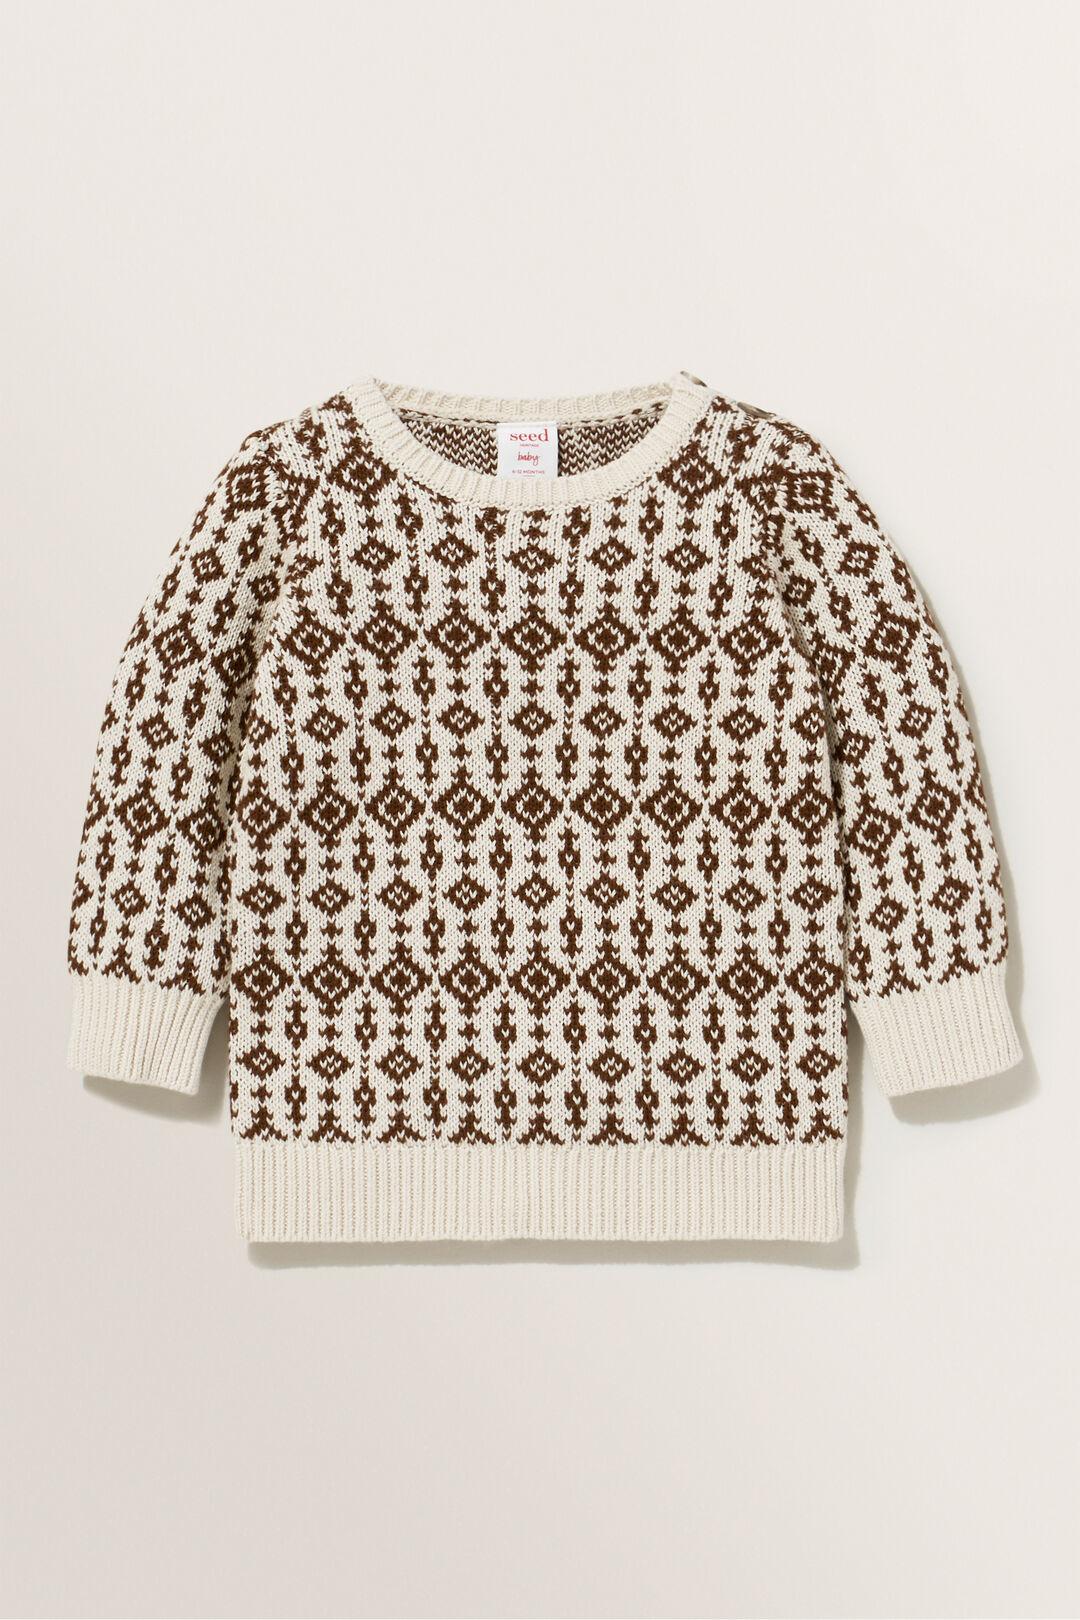 Knit Jacquard Sweater  CREAM  hi-res